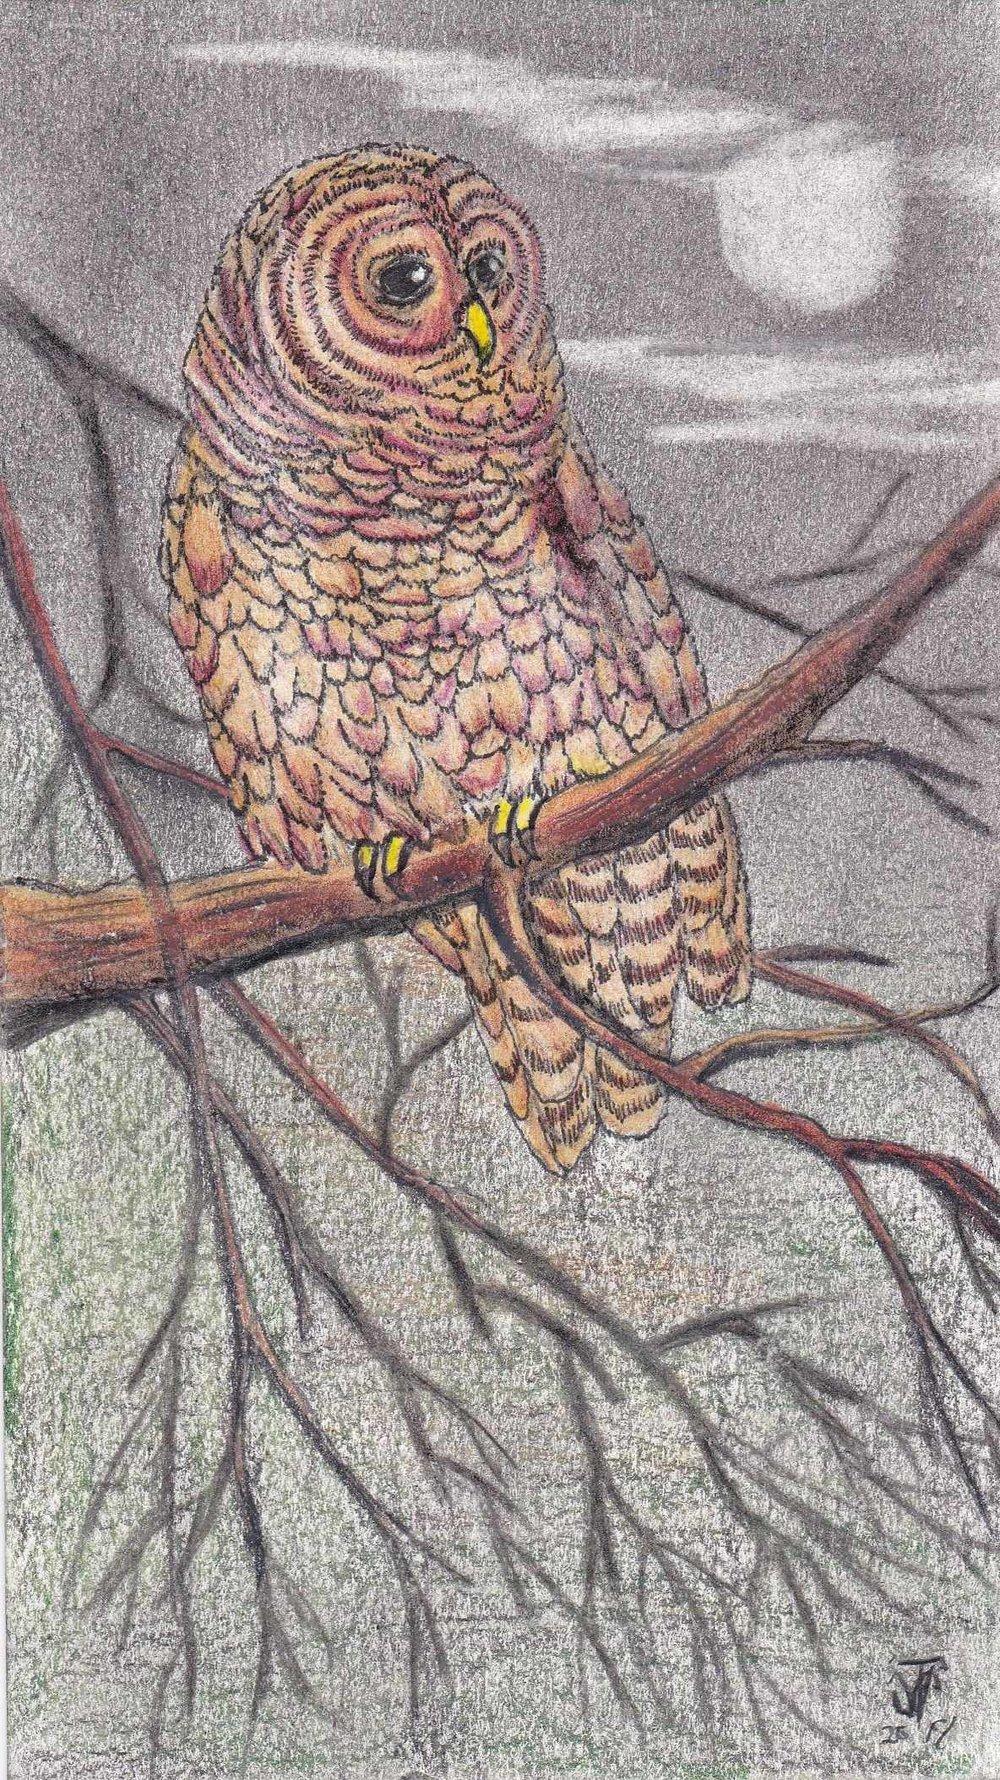 Owl drawign by John VanTielen 7 x4-IMG_20180528_0014 - Copy.jpg